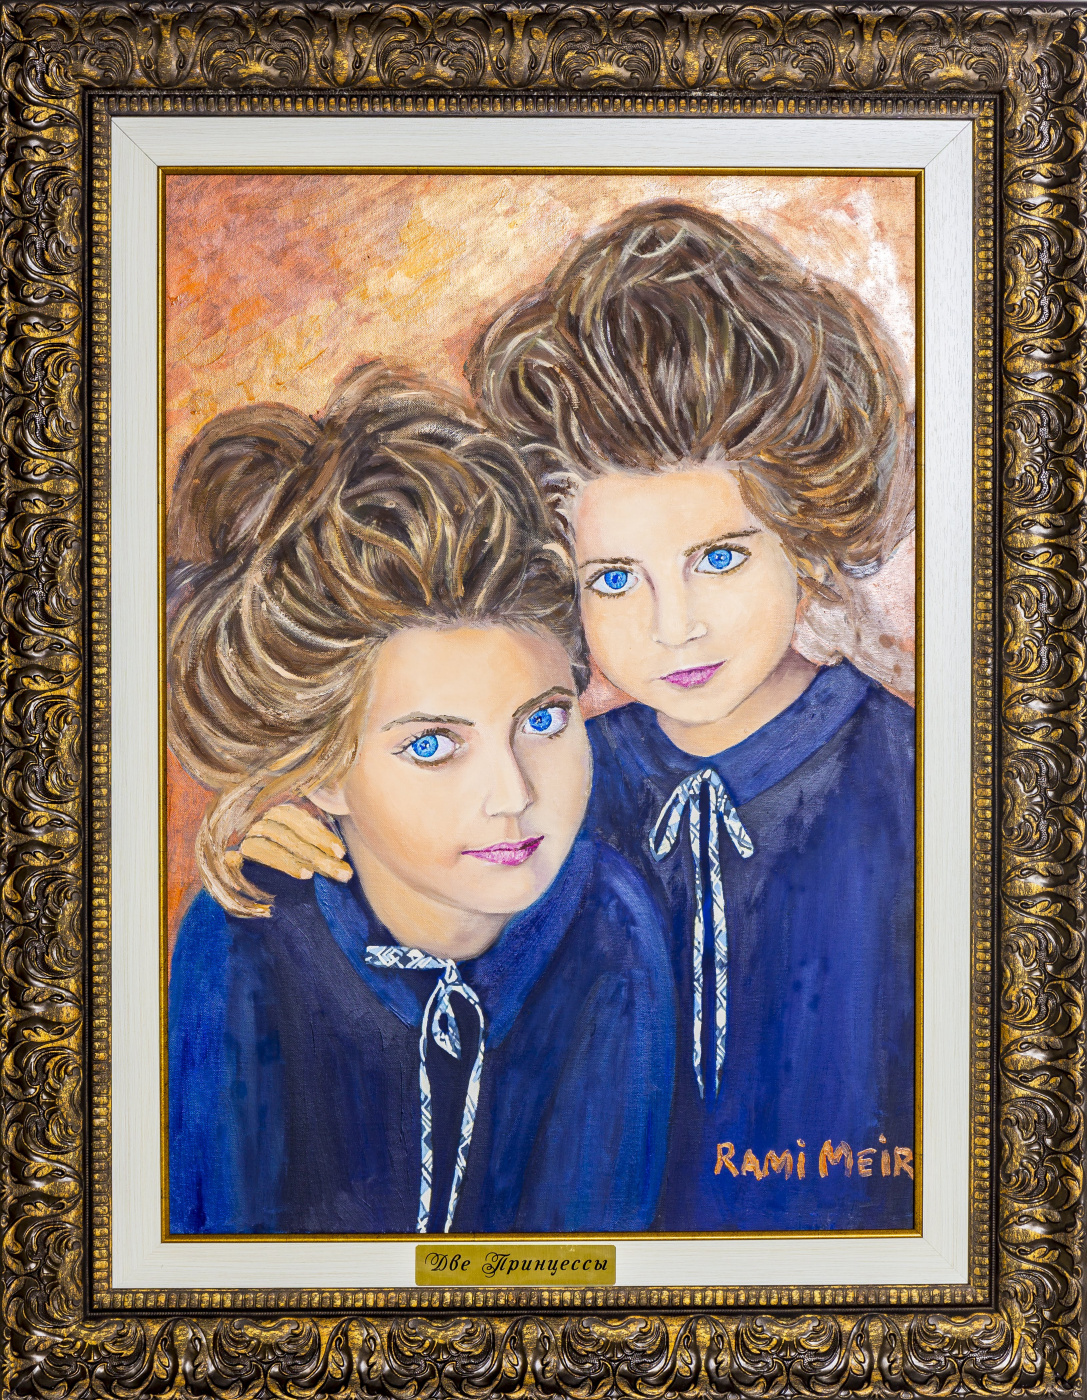 Rami Meir. Two princesses